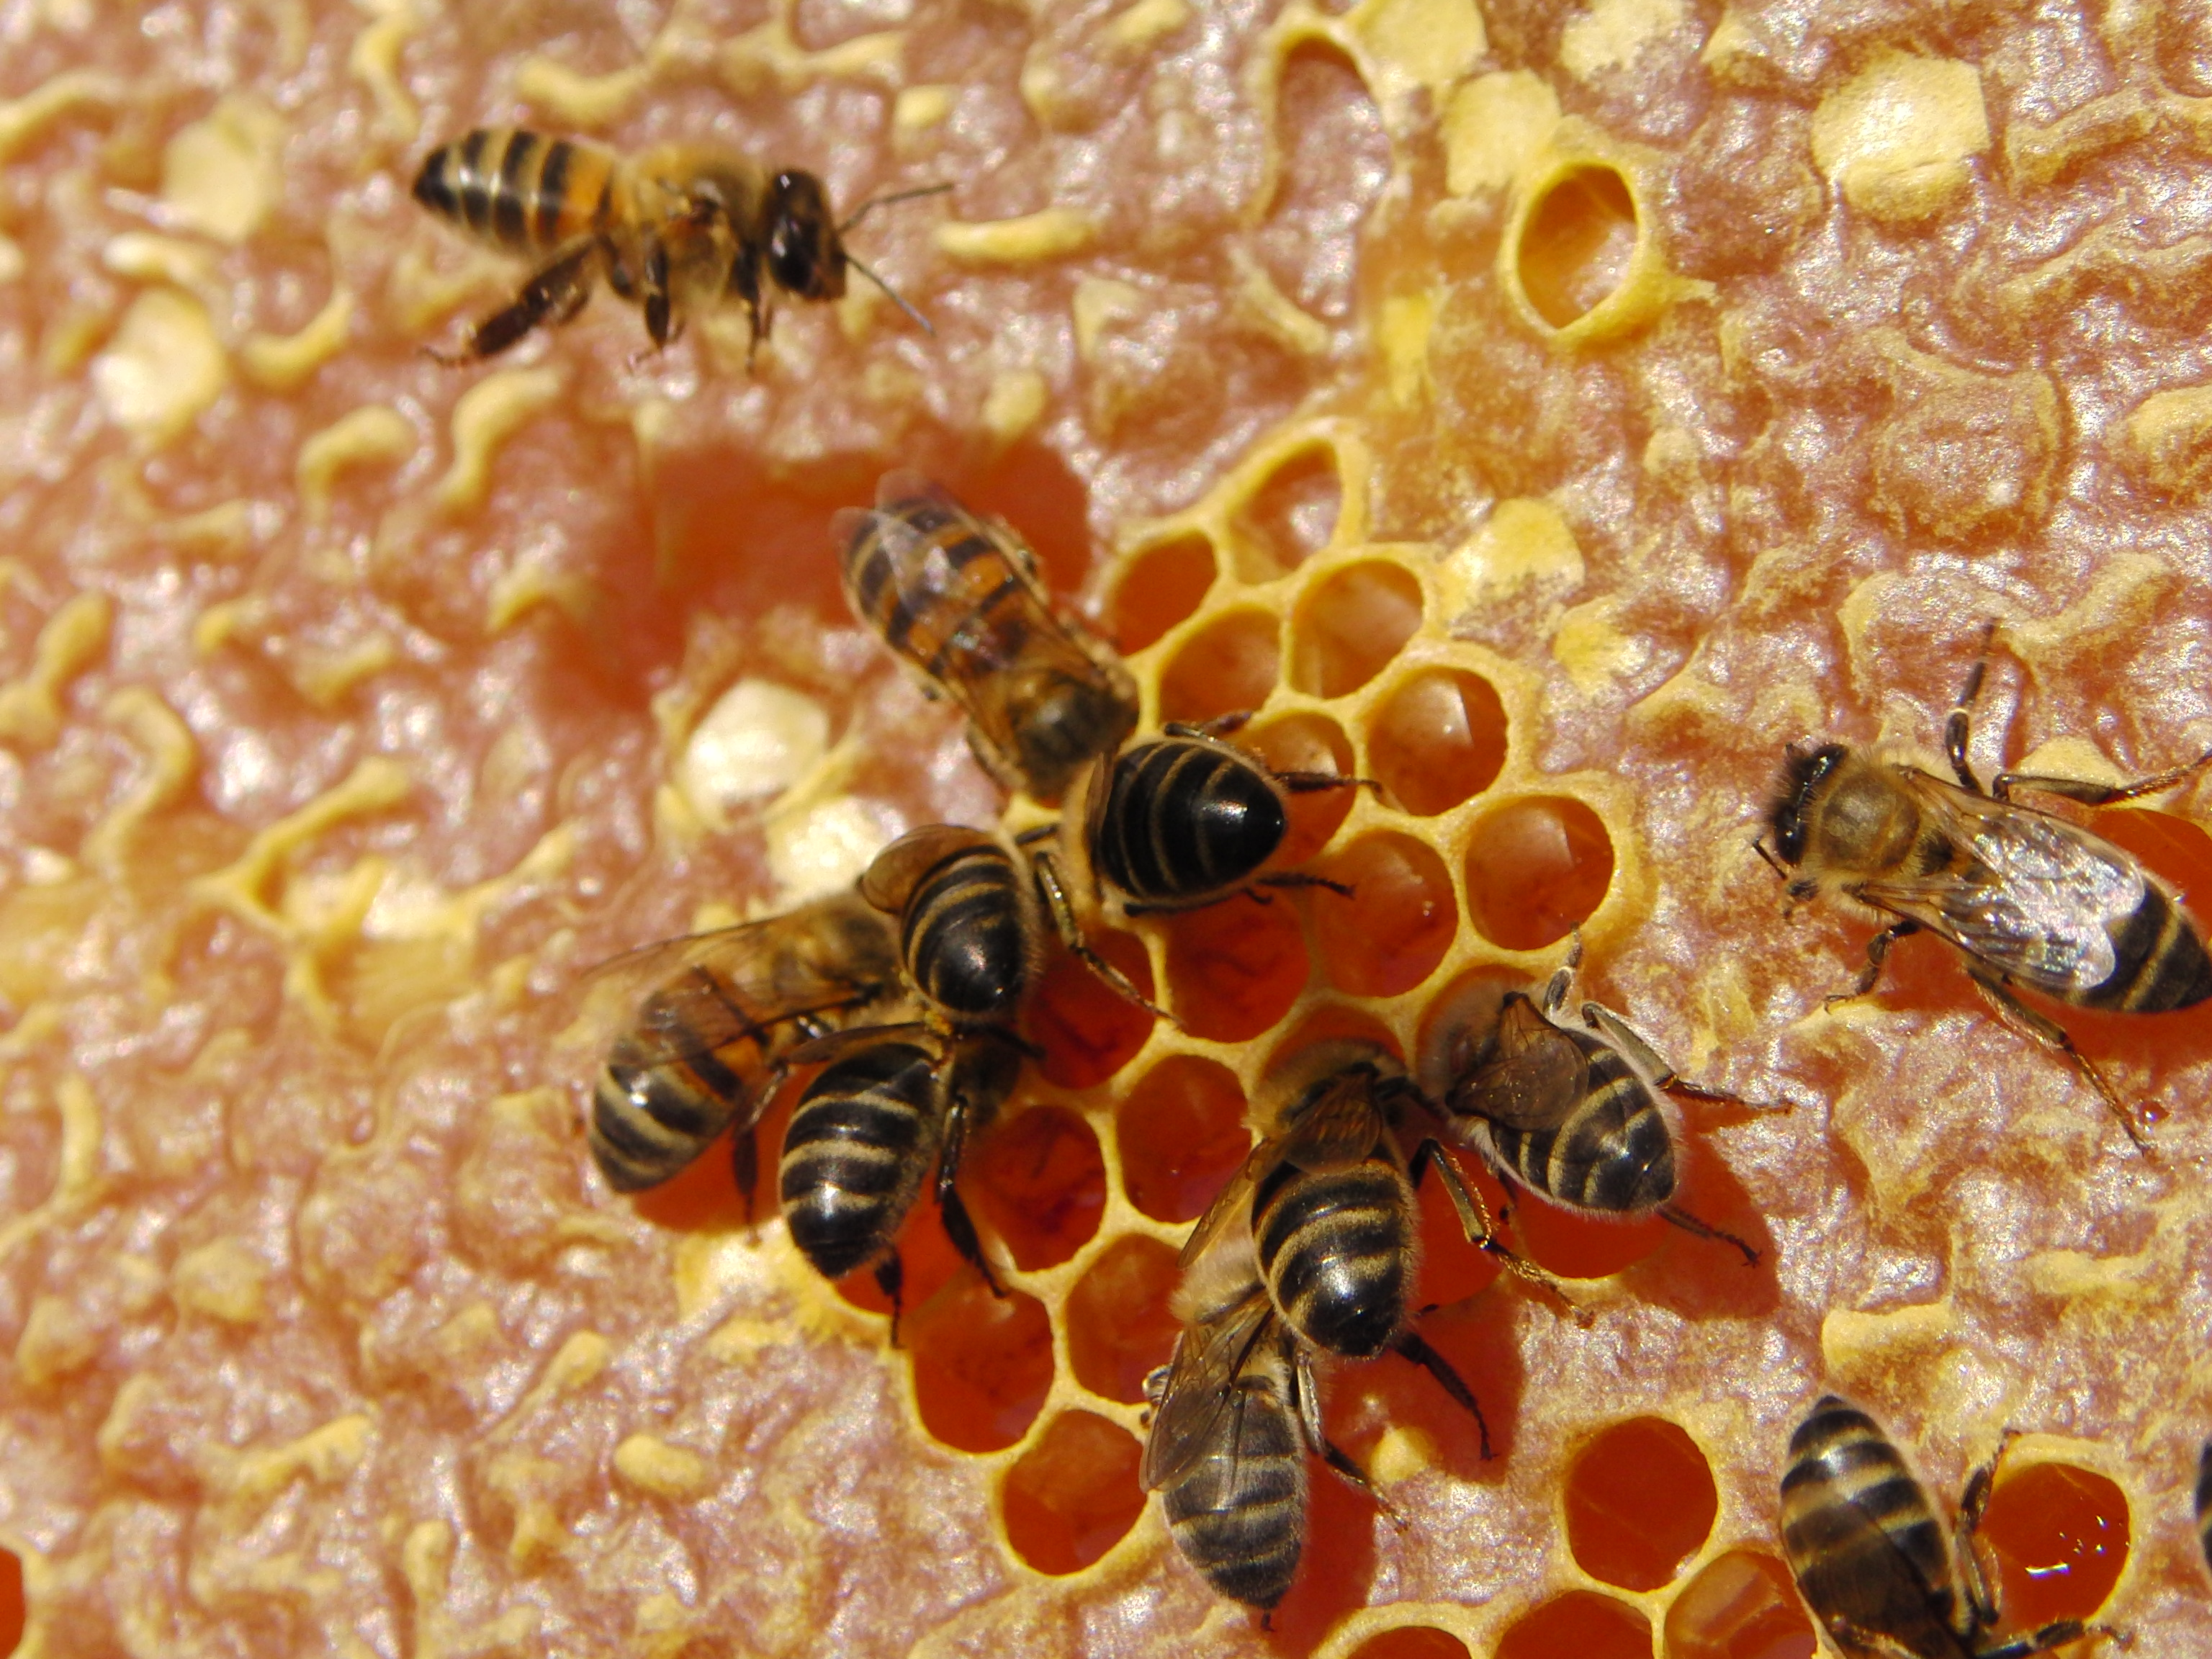 Abeja en panal de miel - Tenerife